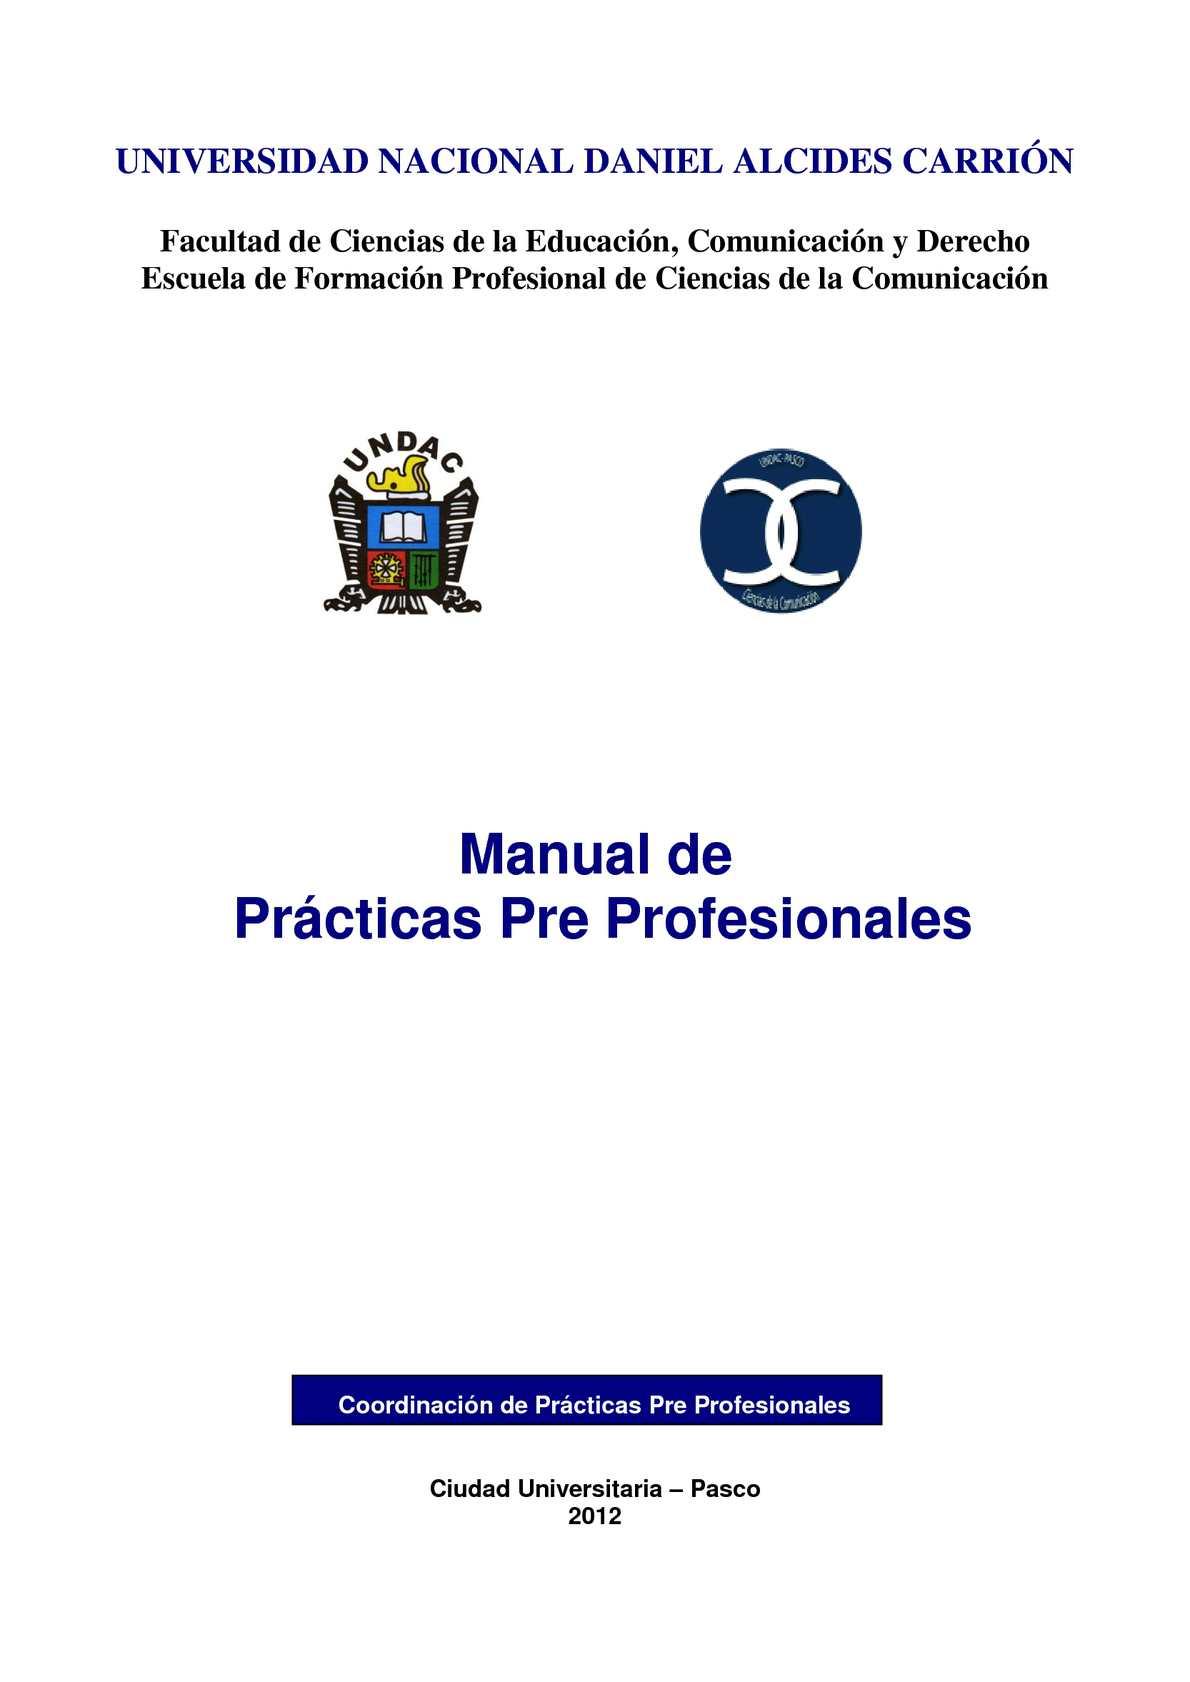 Calaméo - MANUAL DE PRÁCTICAS PRE PROFESIONALES